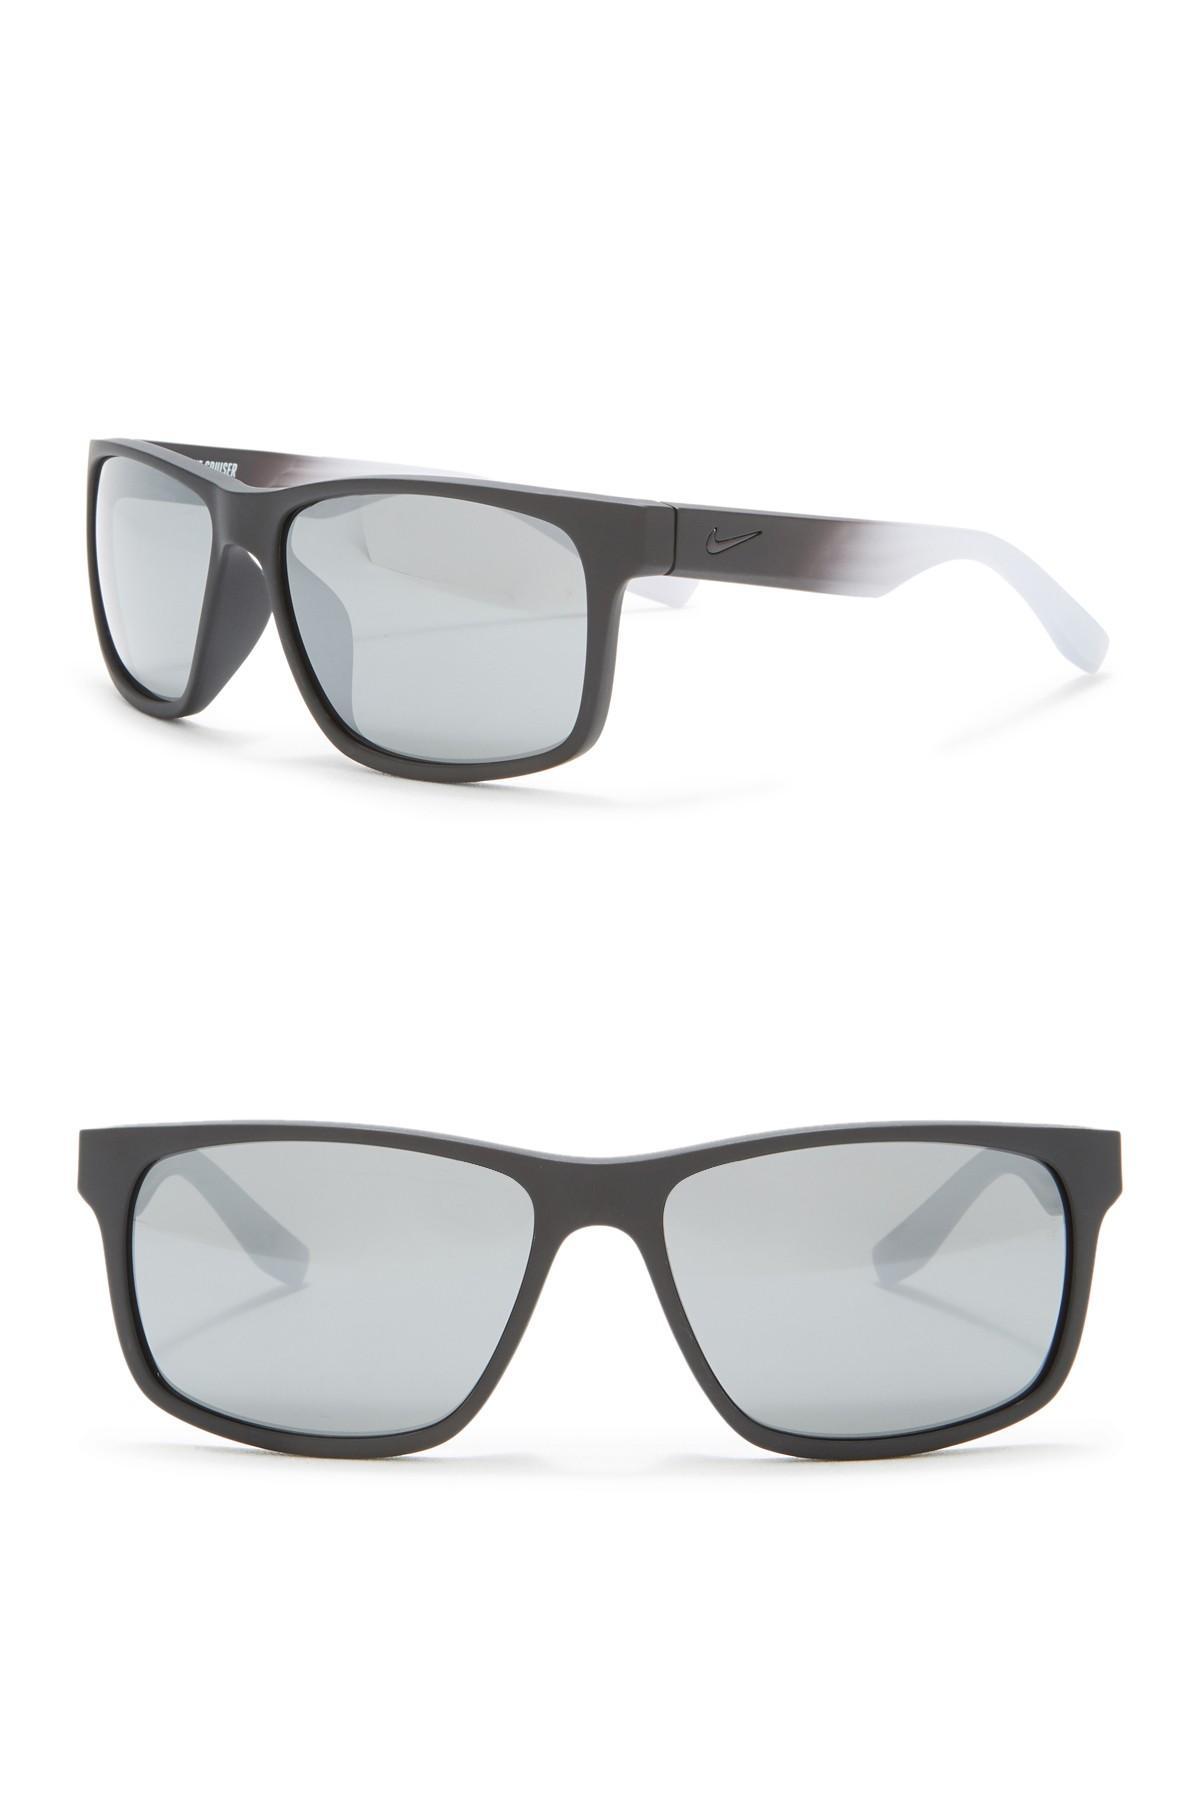 20930eee95 Lyst - Nike Cruiser 59mm Square Sunglasses in Gray for Men